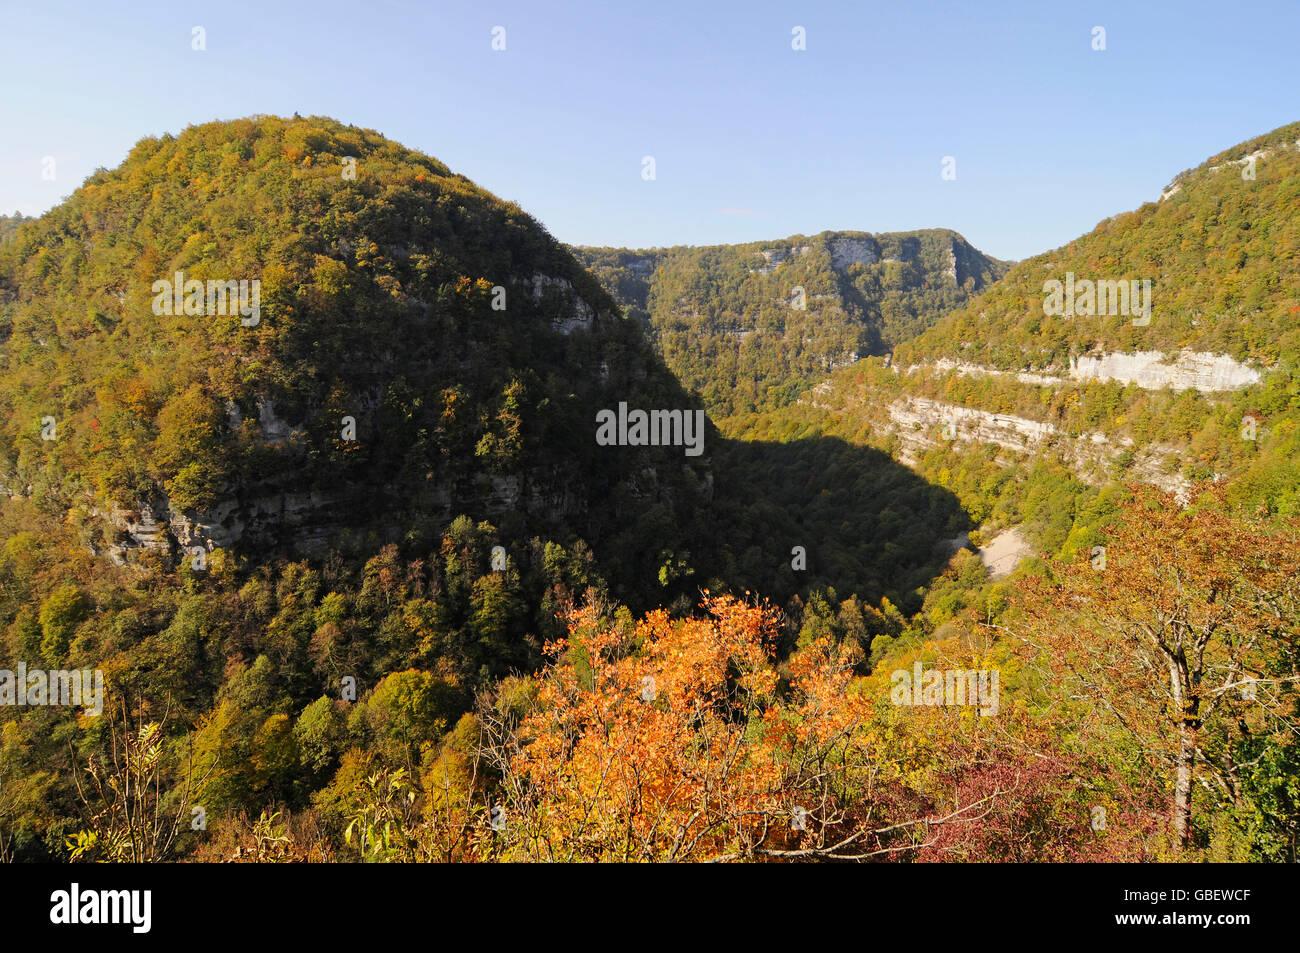 Loue valley, Ornans, Besancon, Doubs, Franche-Comte, France - Stock Image